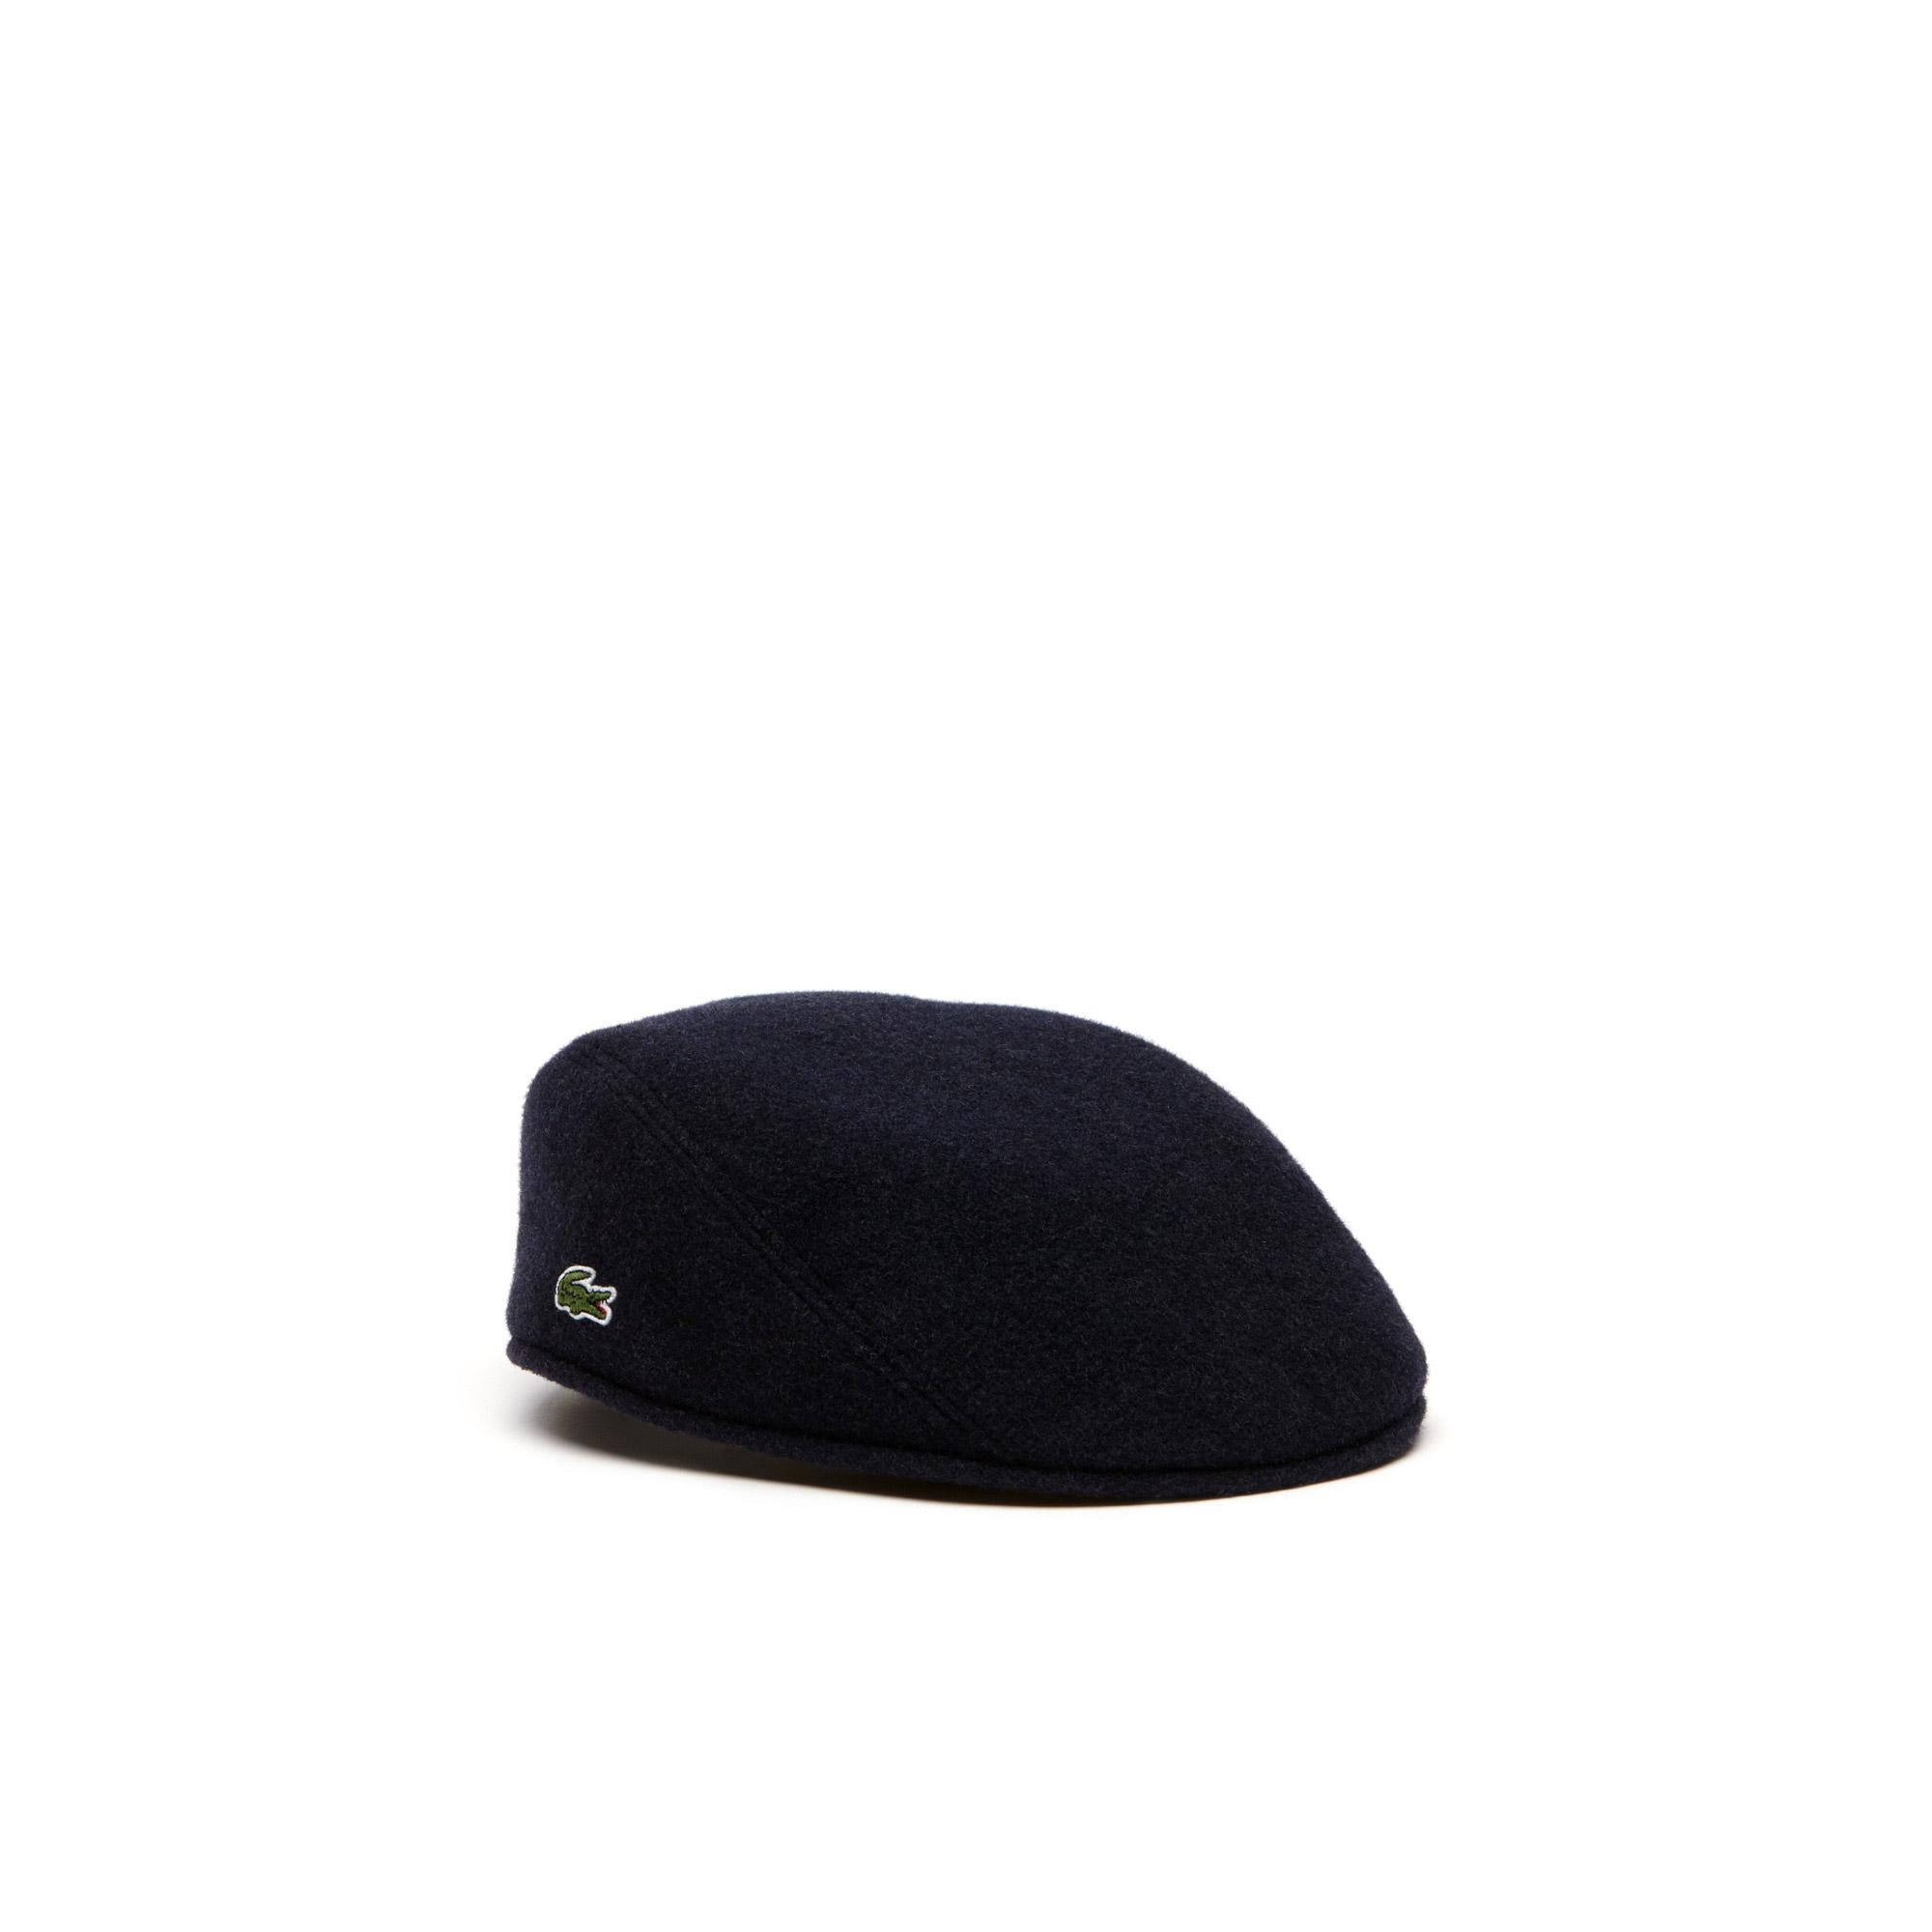 Lacoste Men's Wool Broadcloth Flat Cap